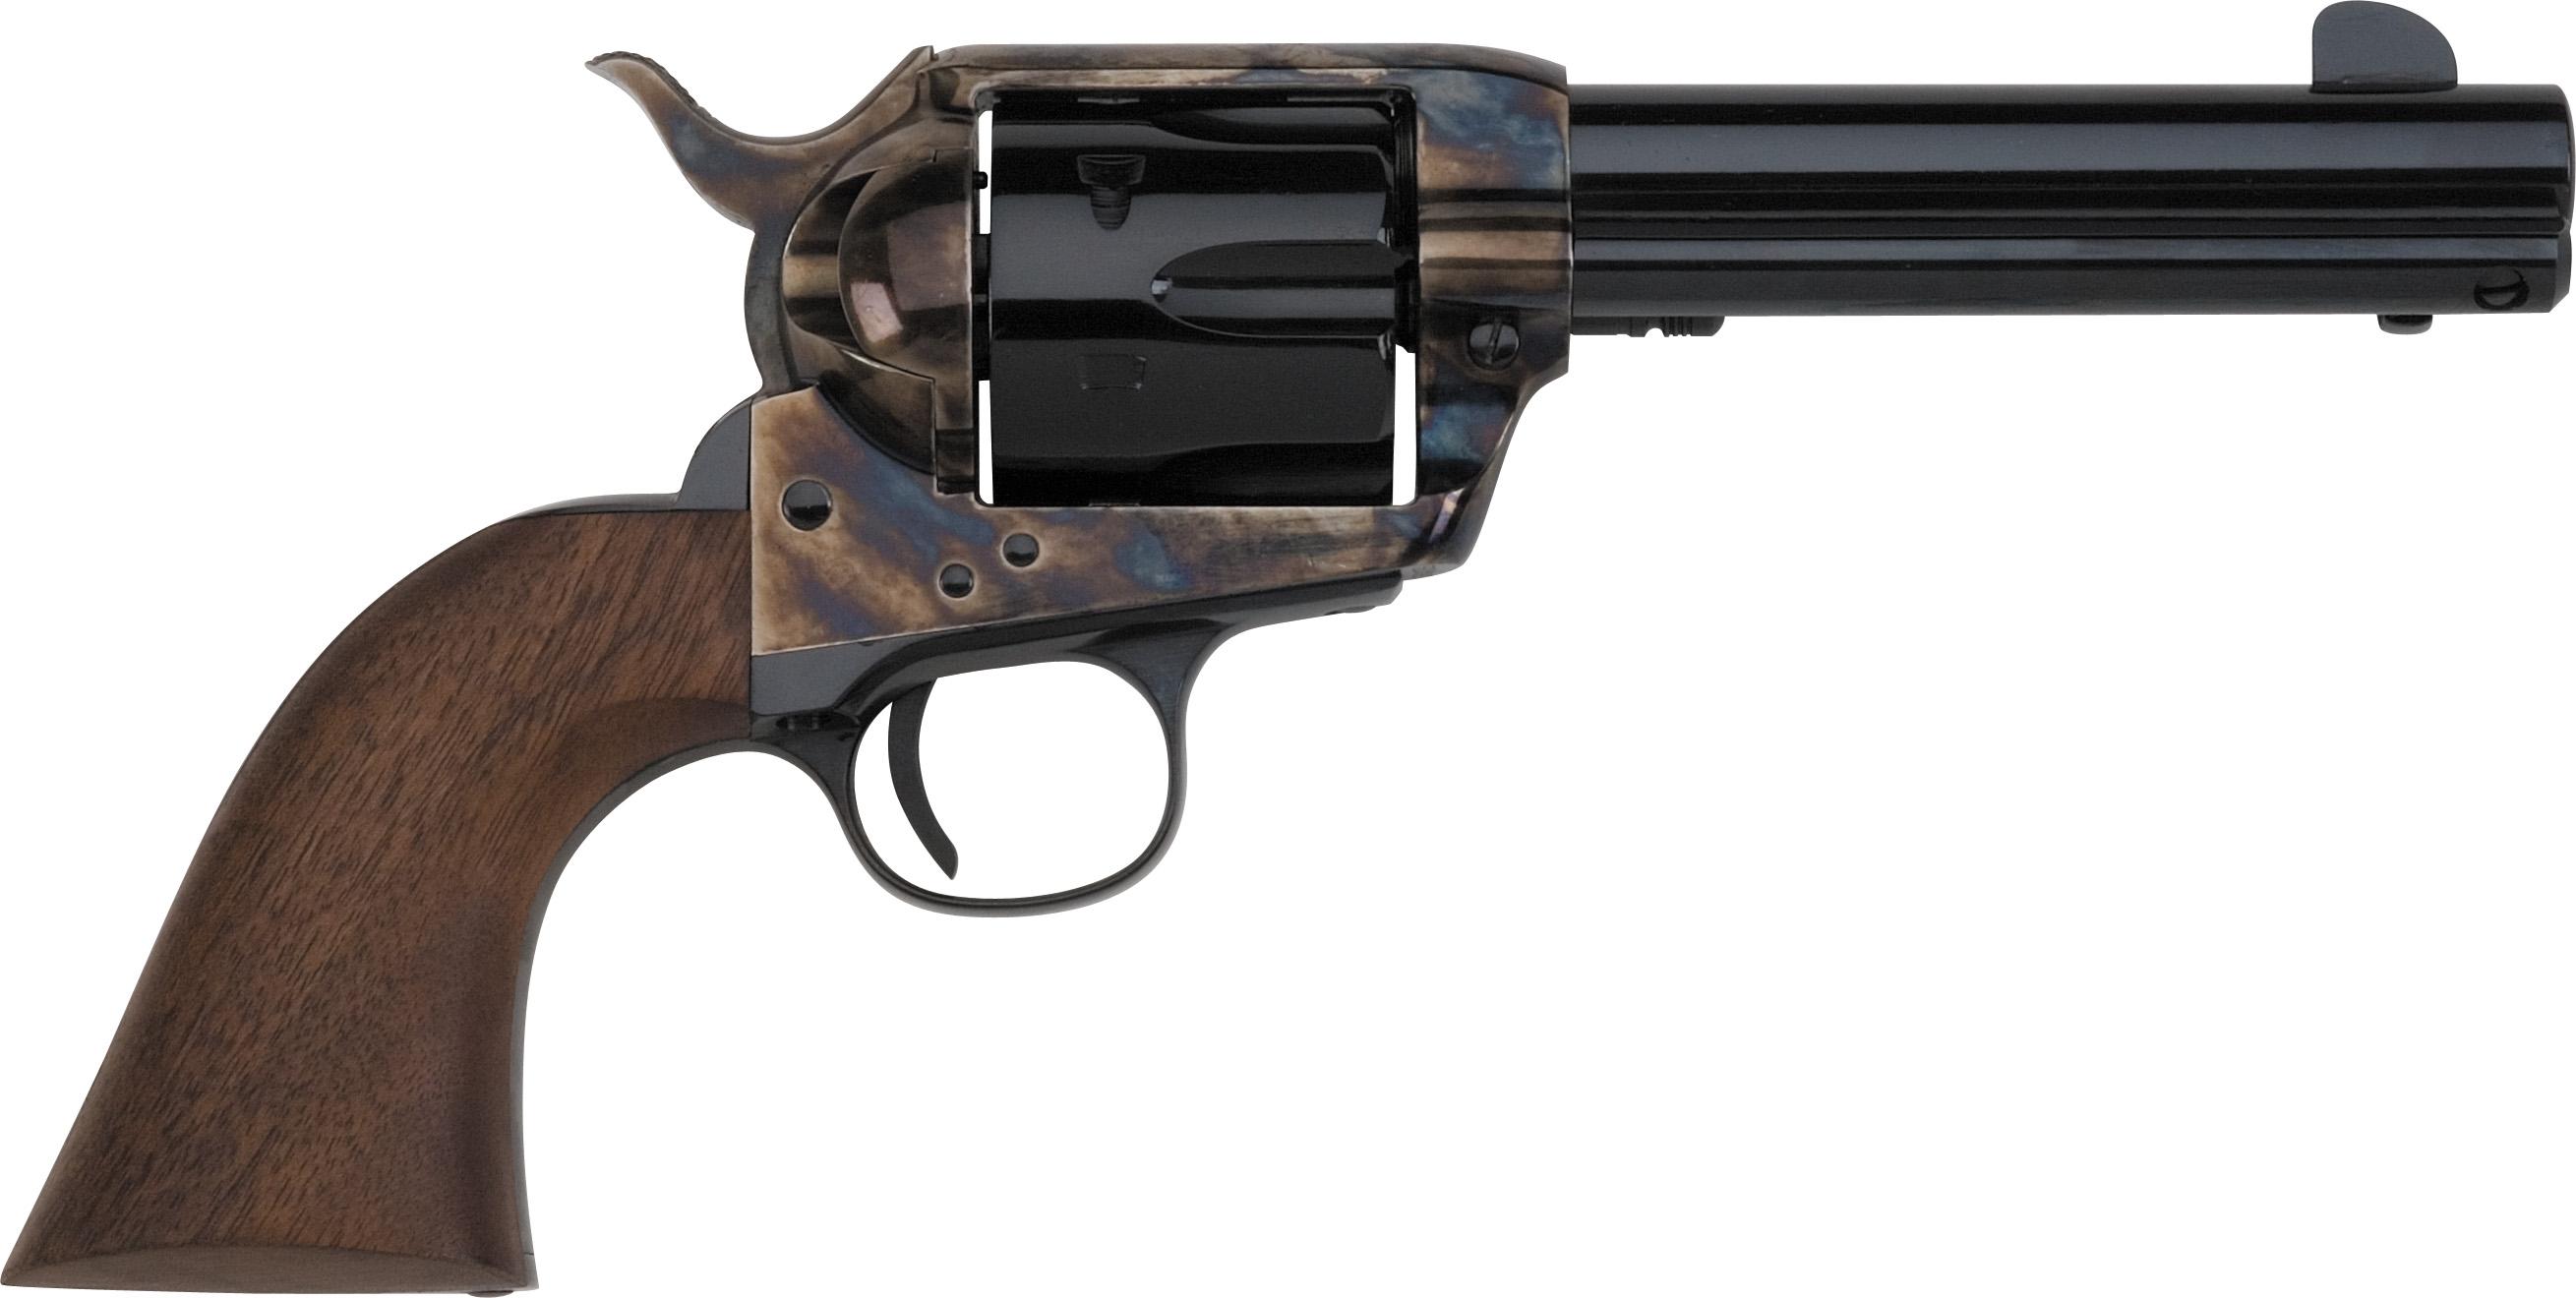 Drawn pistol western gun Revolvers Great Western Revolvers Company